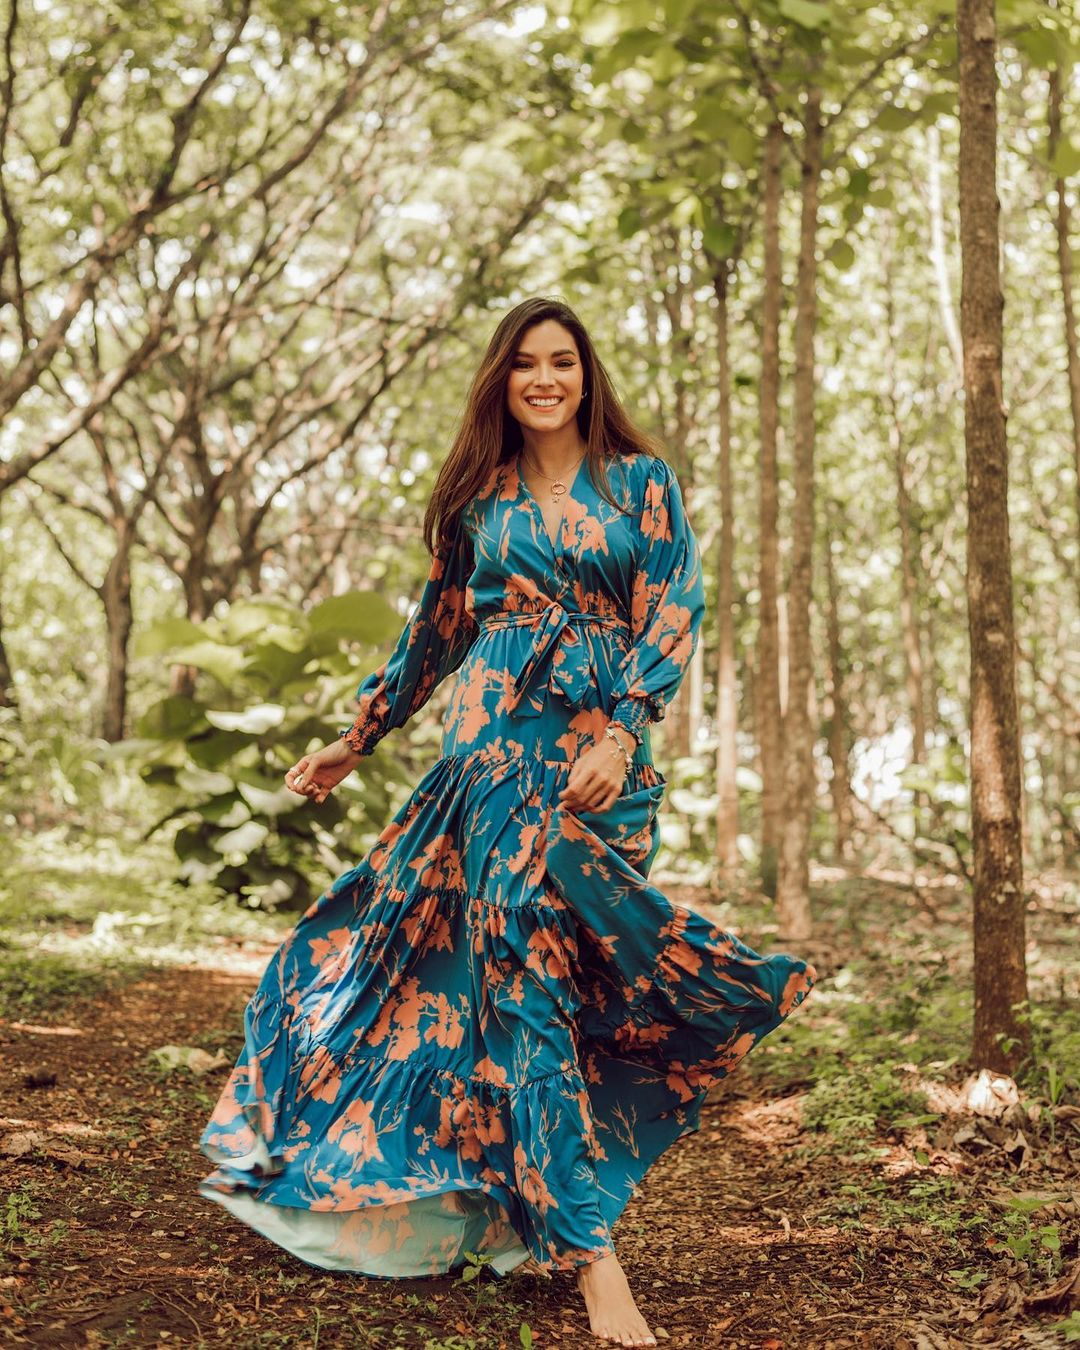 Maria-Gonzalez-Roesch-Wallpapers-Insta-Fit-Bio-4